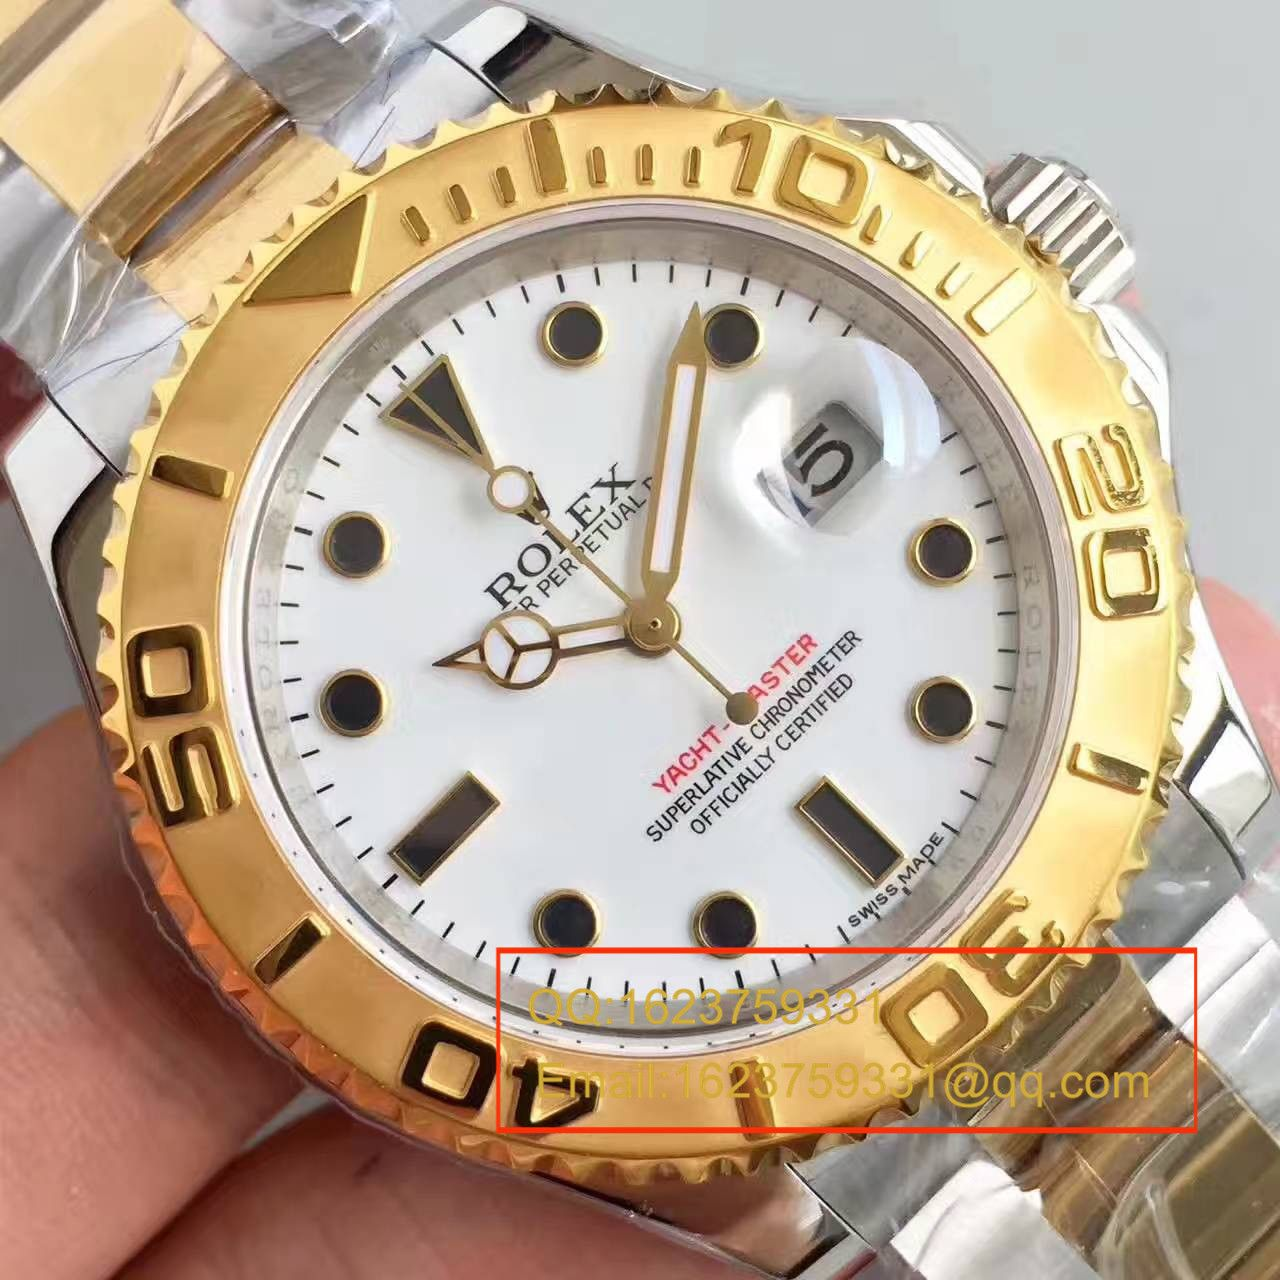 【JF厂一比一超A复刻手表】劳力士游艇名仕型系列16623-78763白盘男士机械腕表 / R097